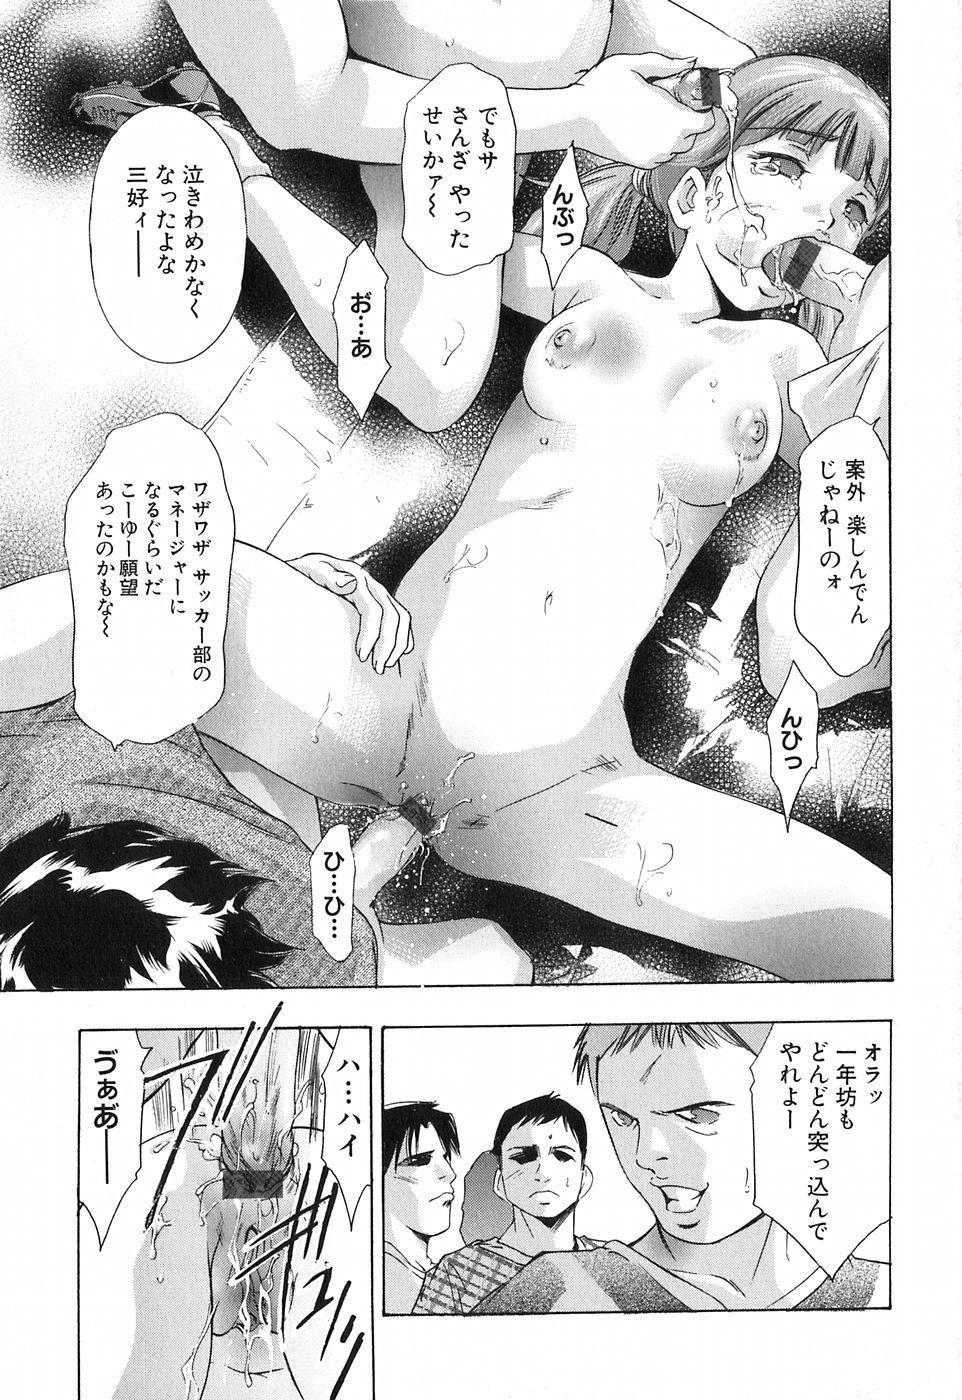 Uchi Naru Koe - Voice which becomes inside 132